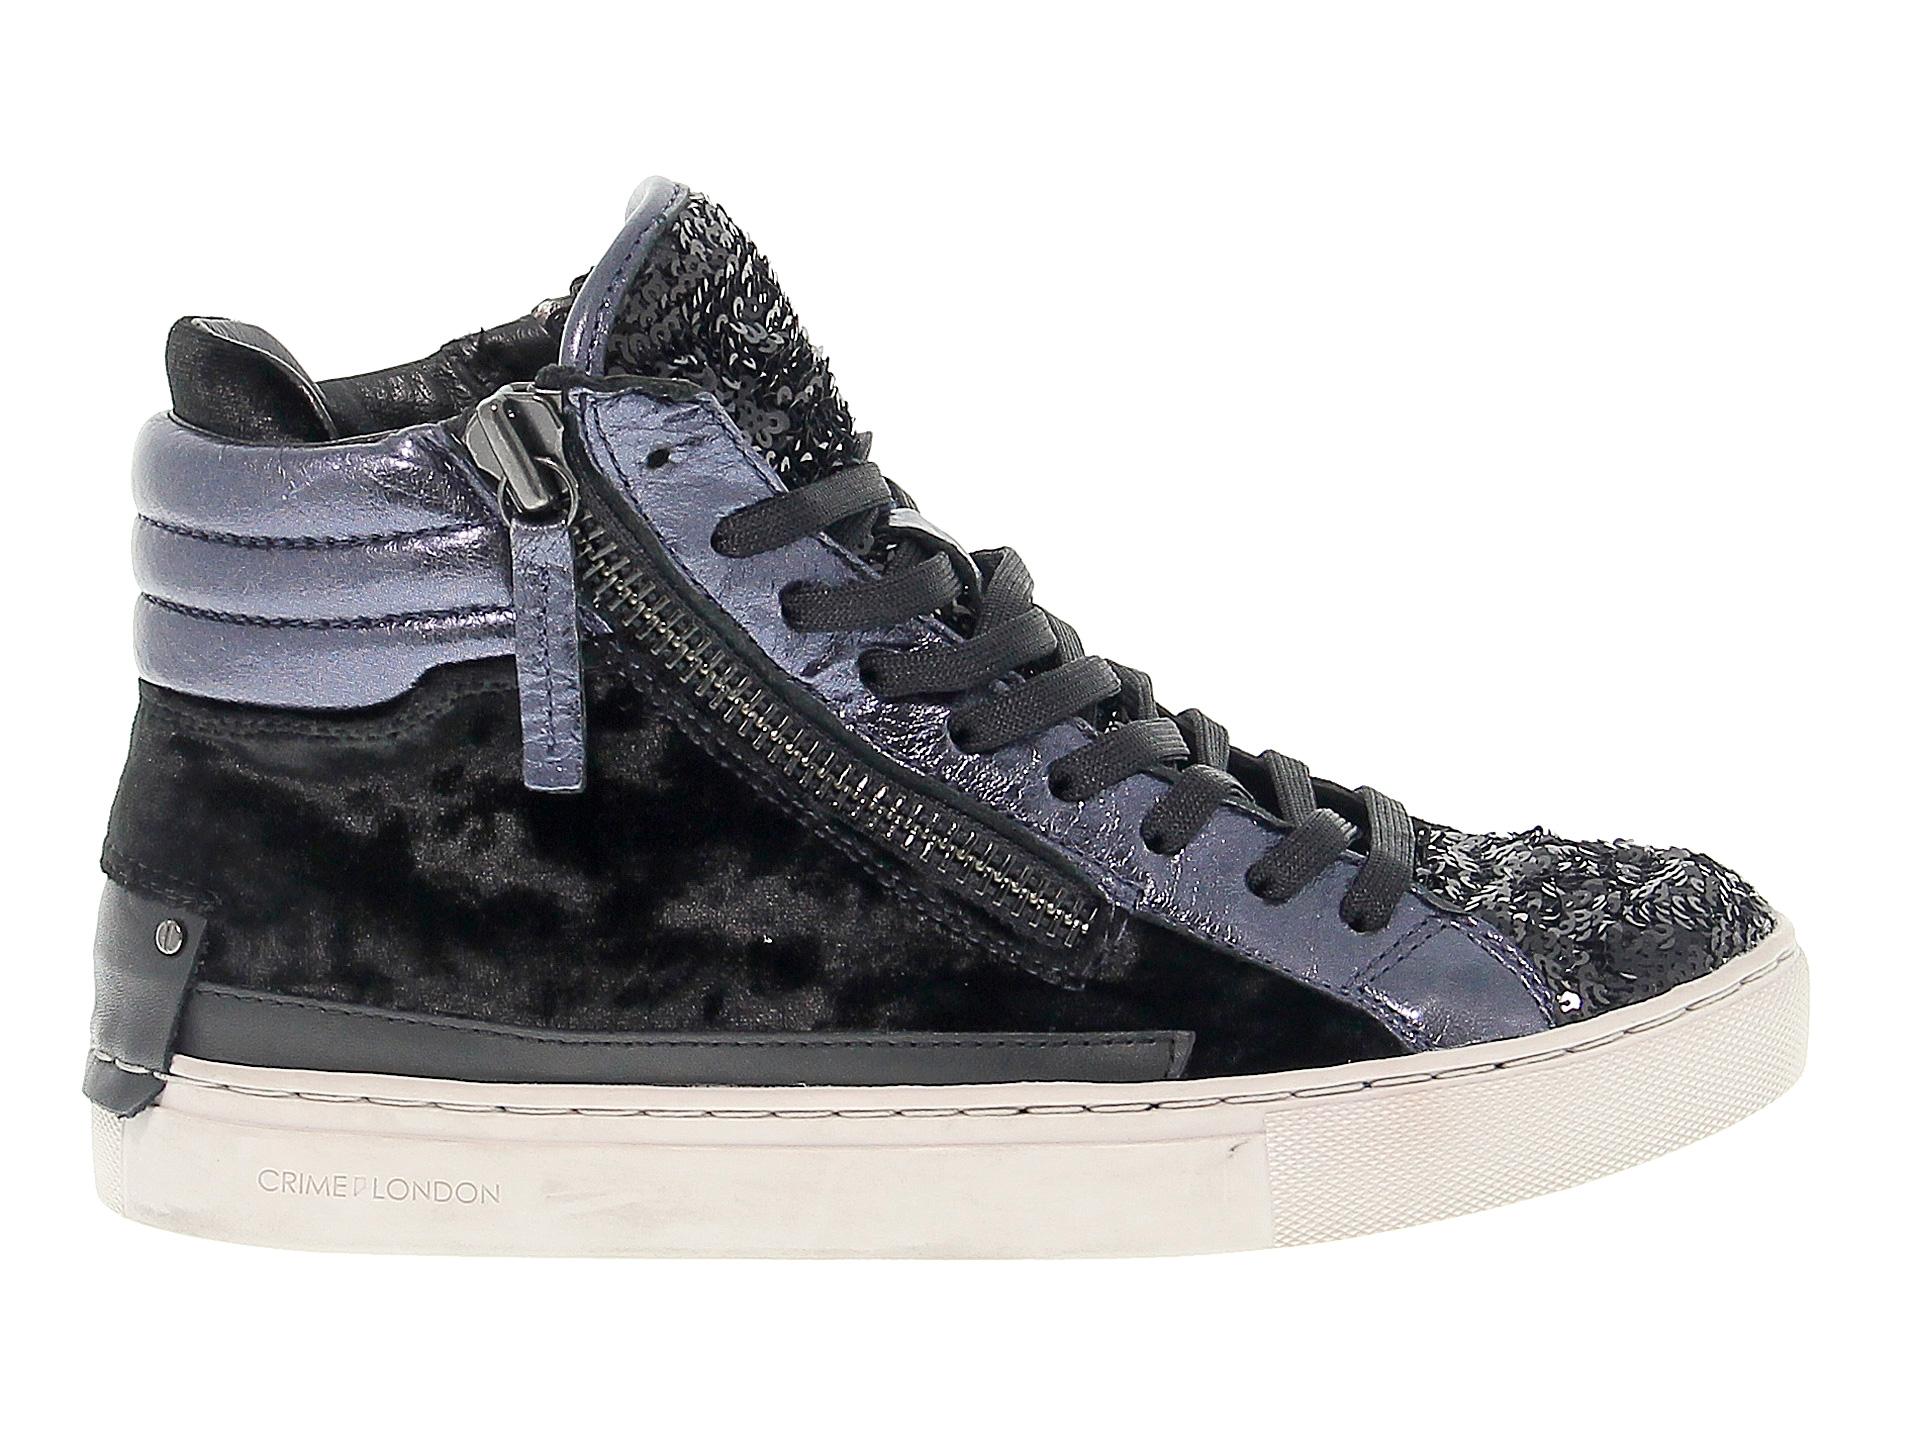 Sneakers Crime London in pelle